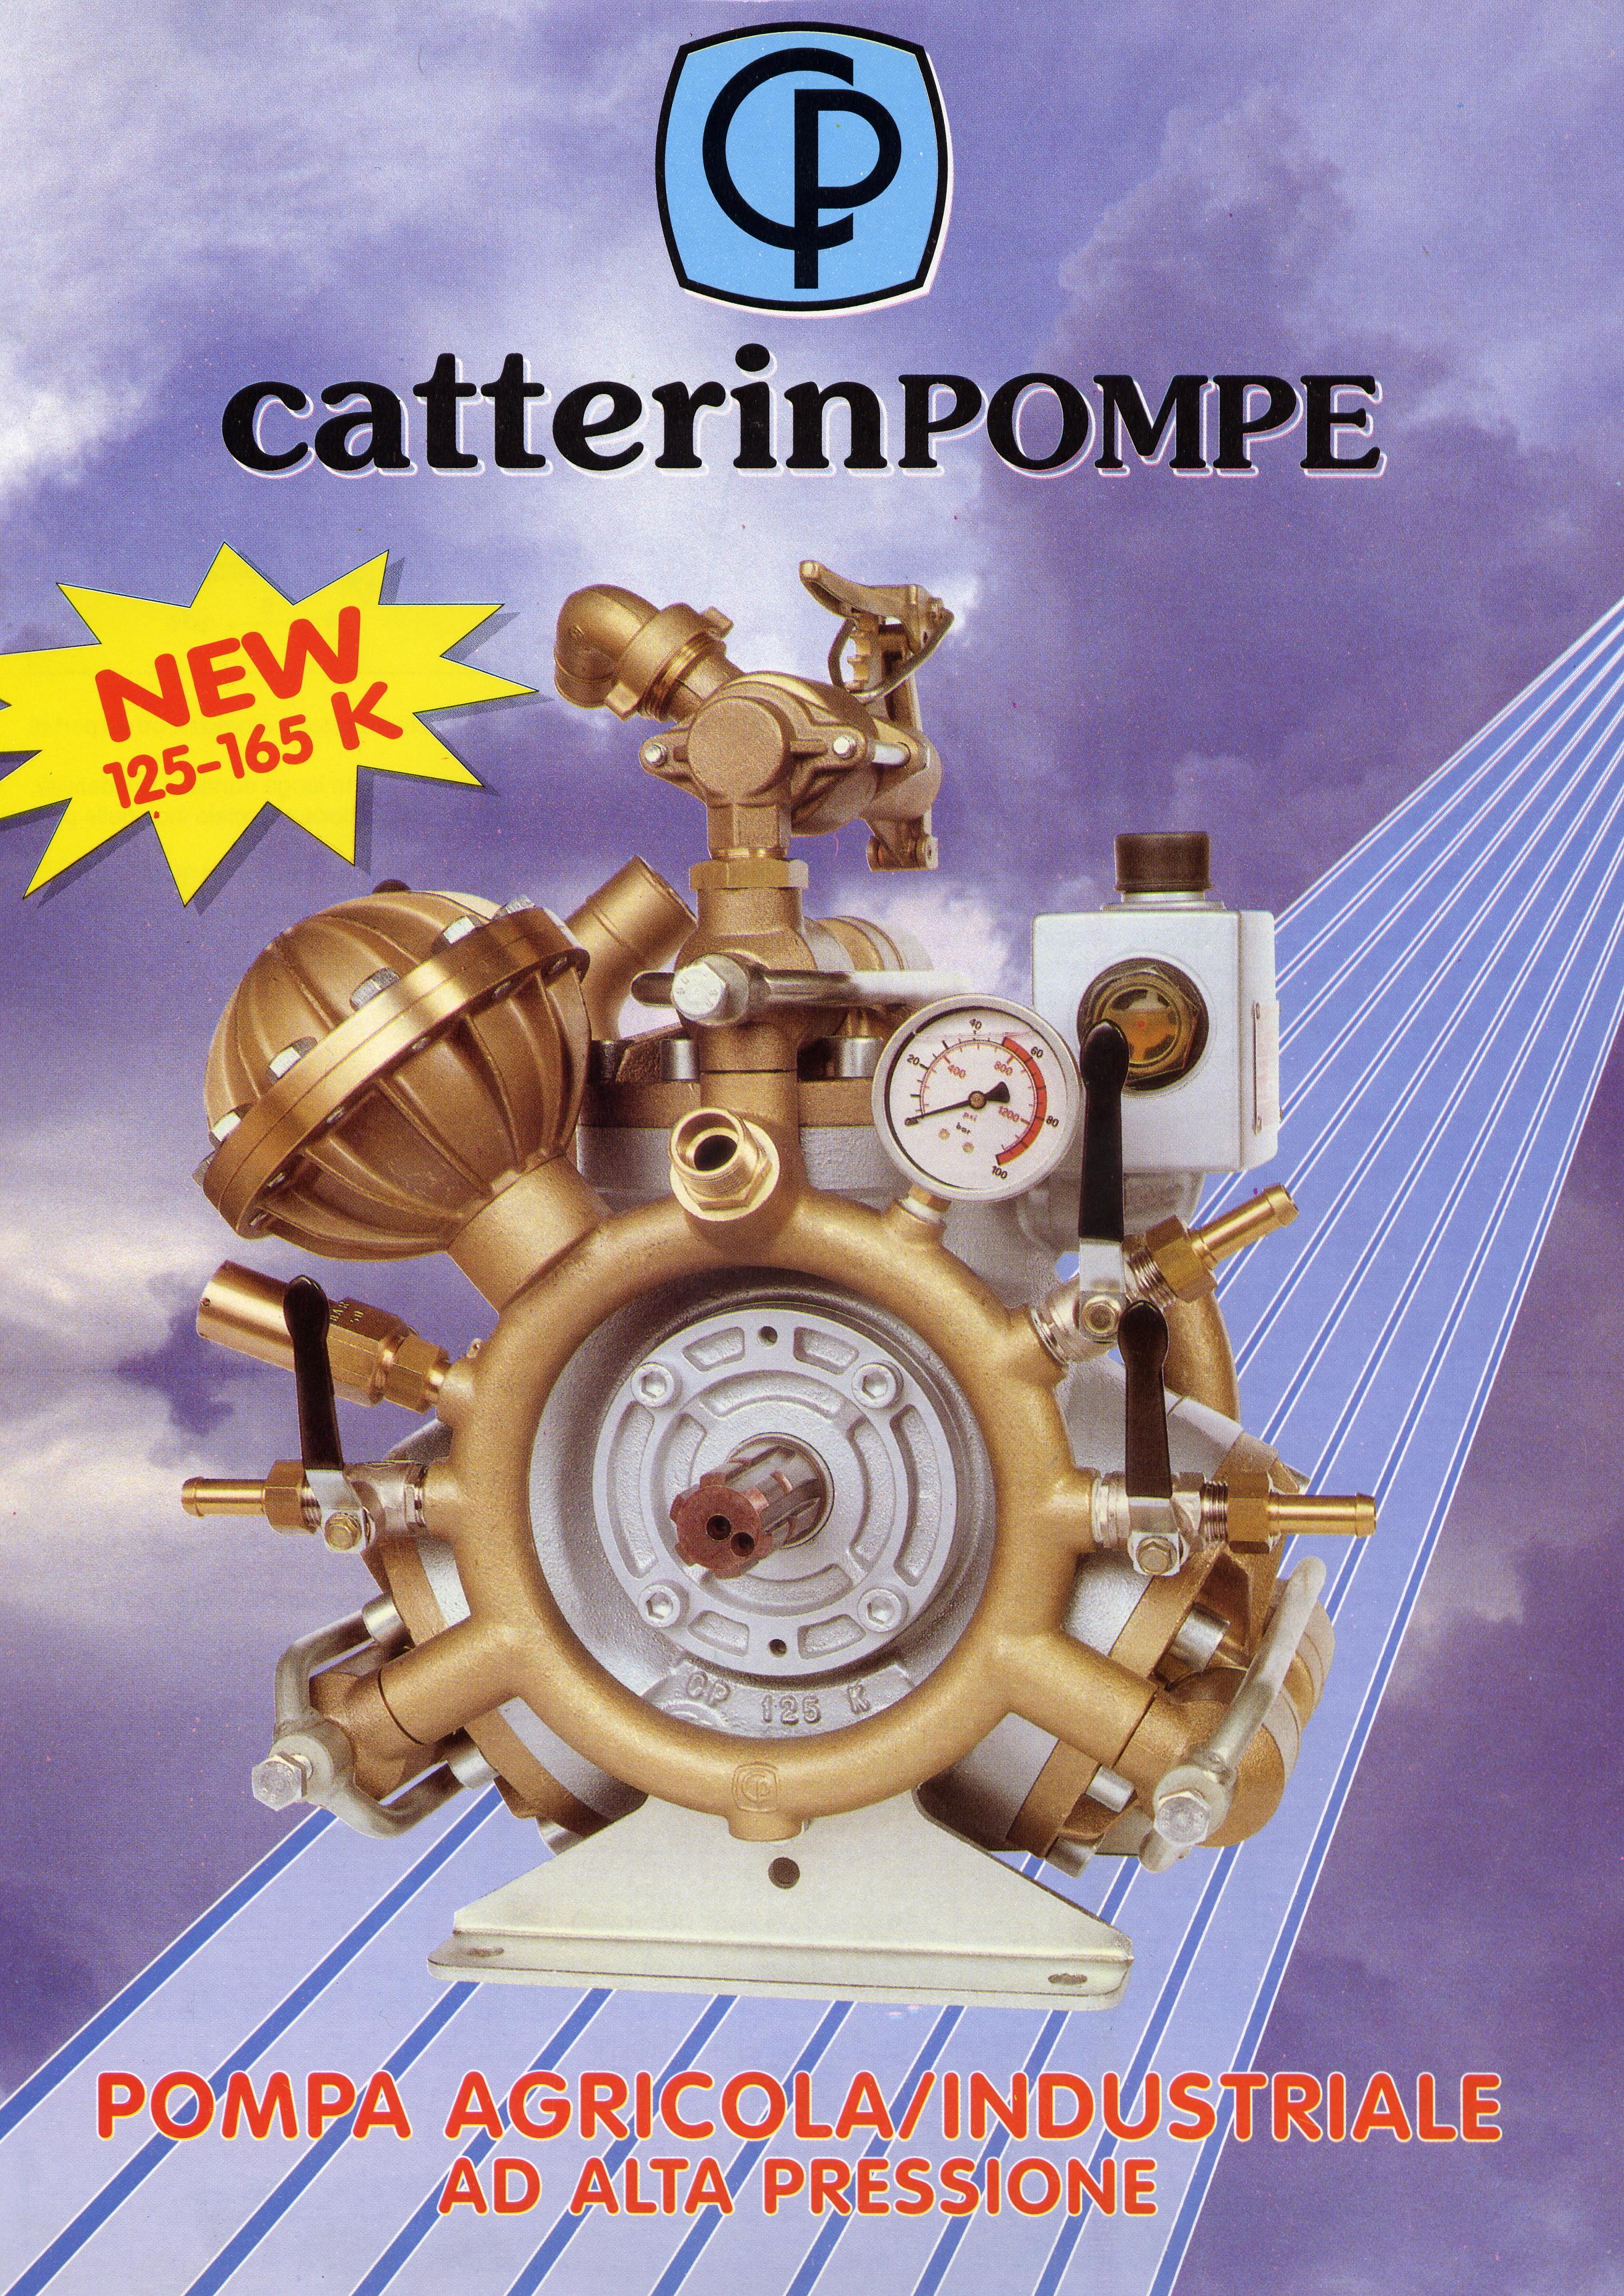 catterin1